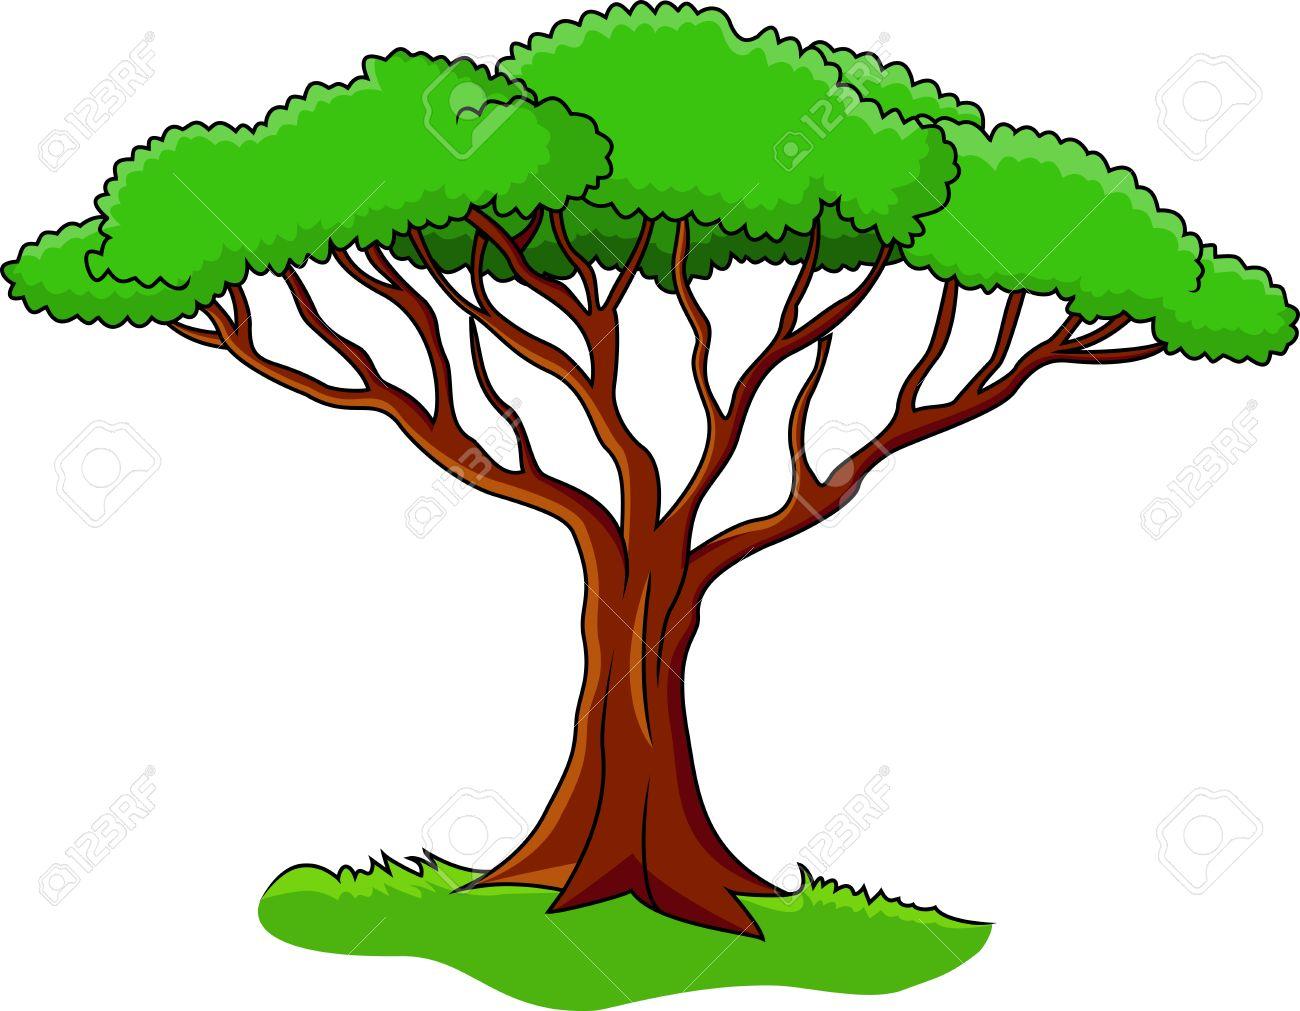 Baum clipart #5, Download drawings